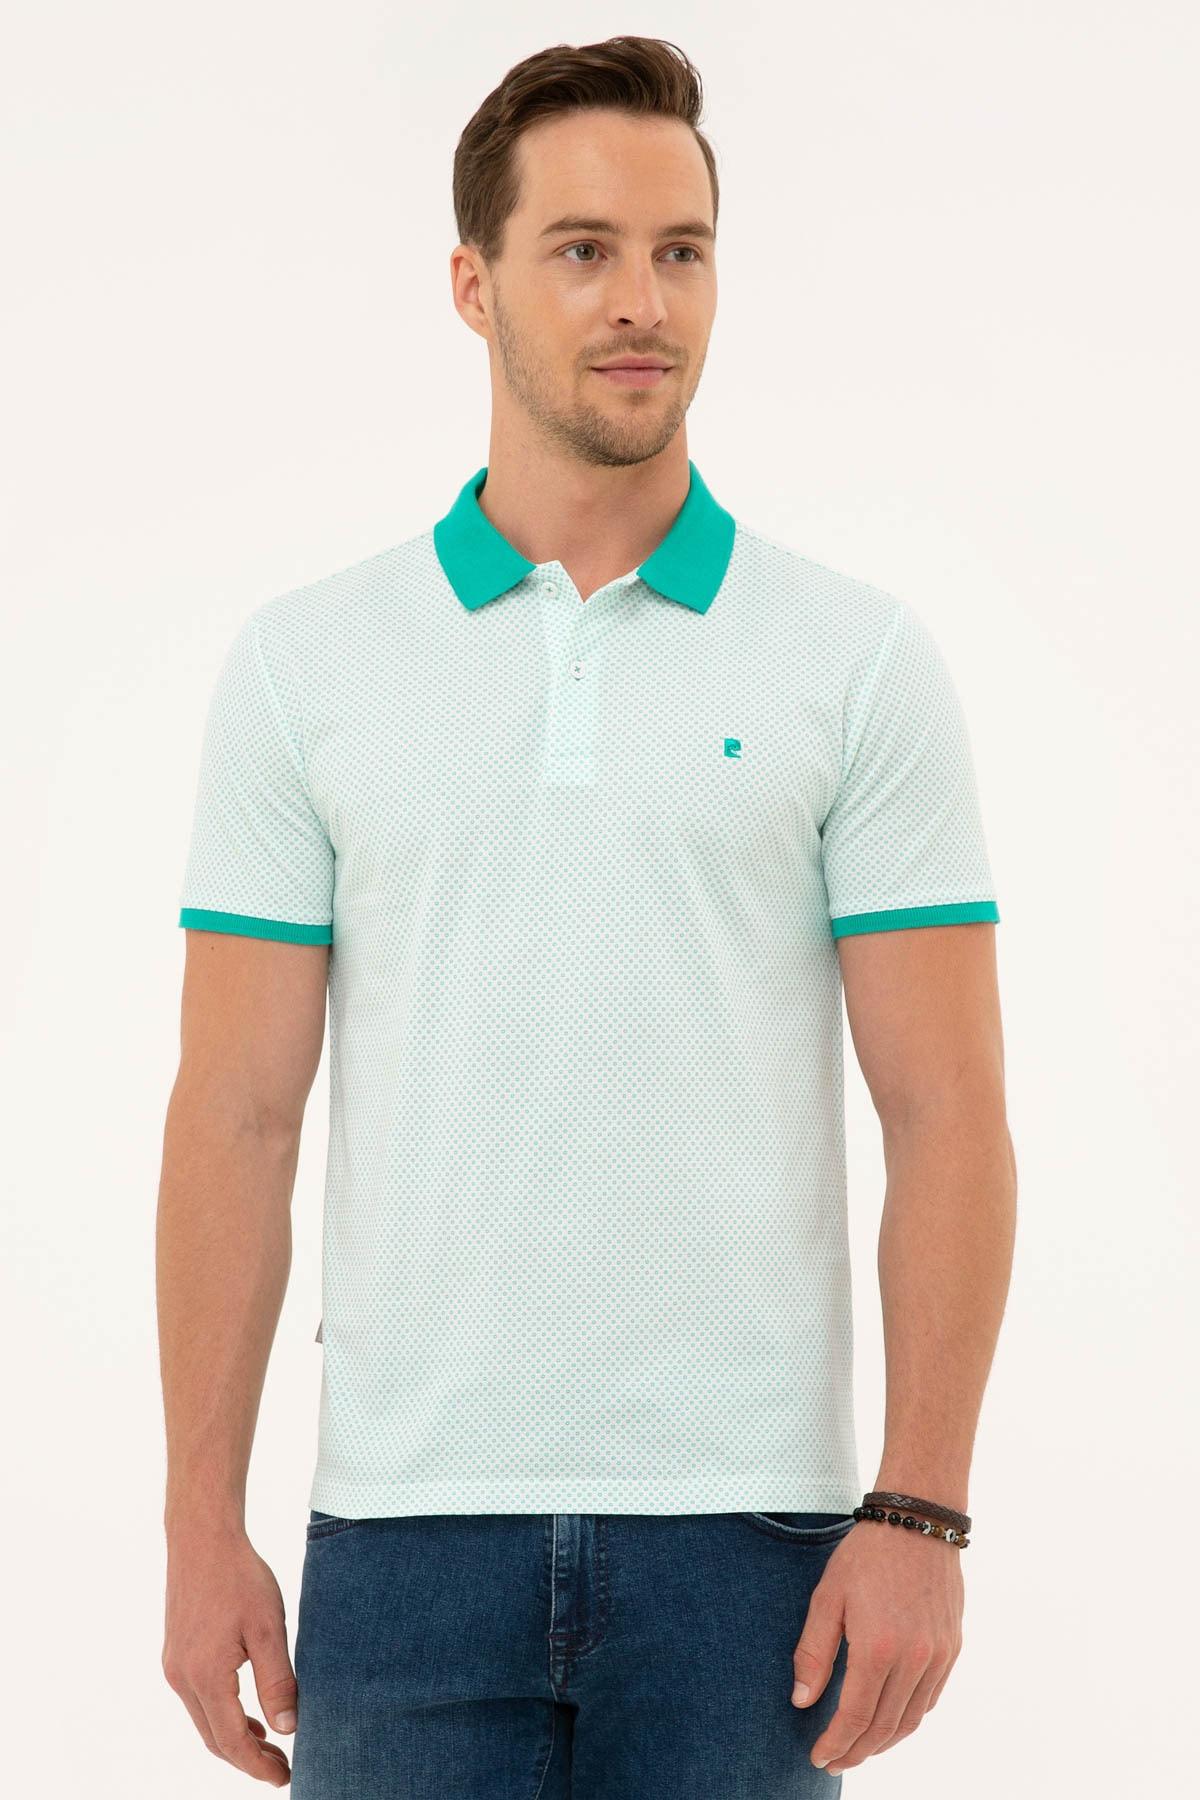 Pierre Cardin Erkek Mint Yeşil Slim Fit Polo Yaka T-Shirt 1